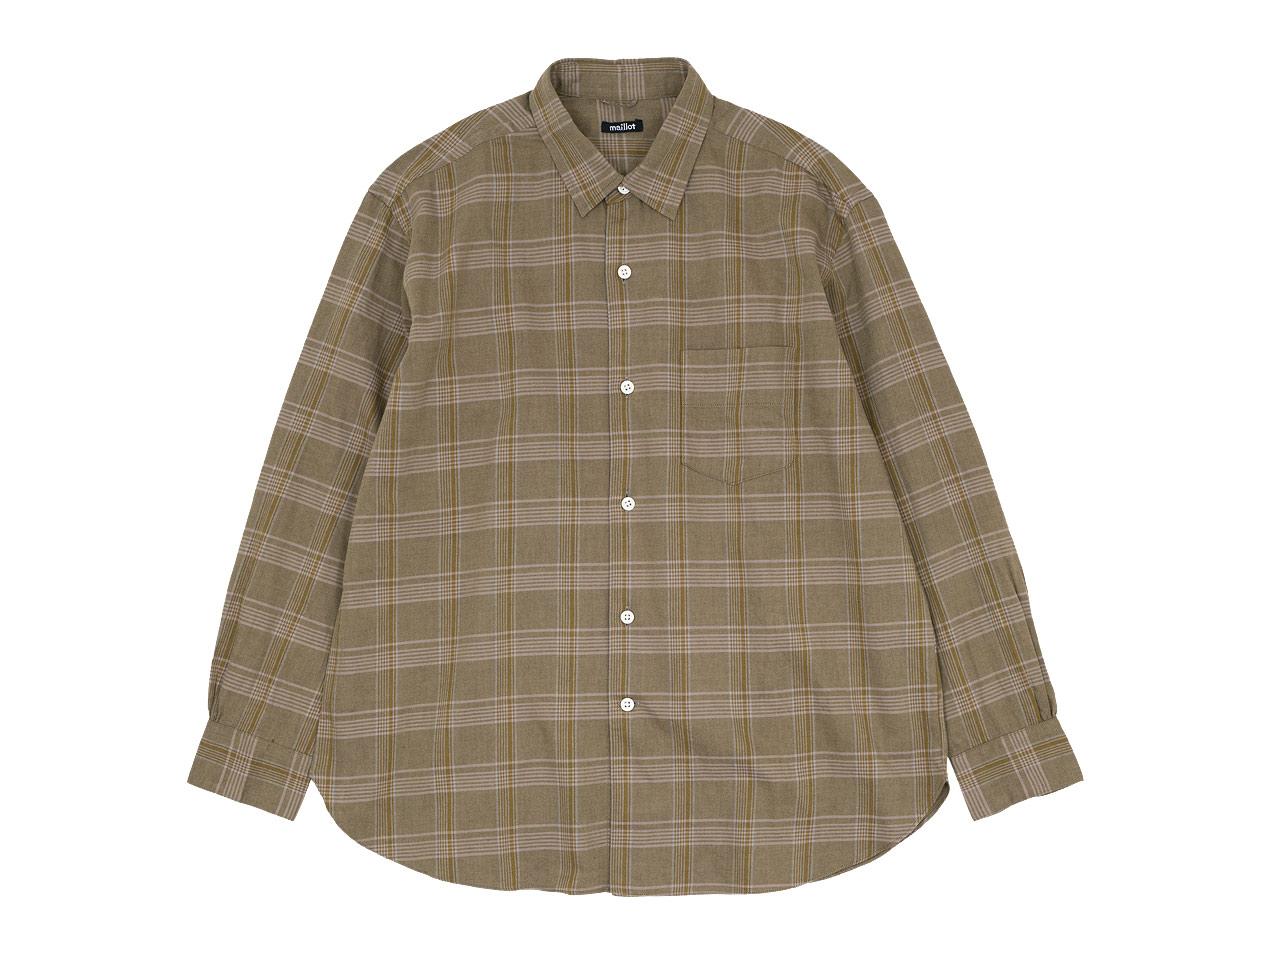 maillot mature twill check regular shirts